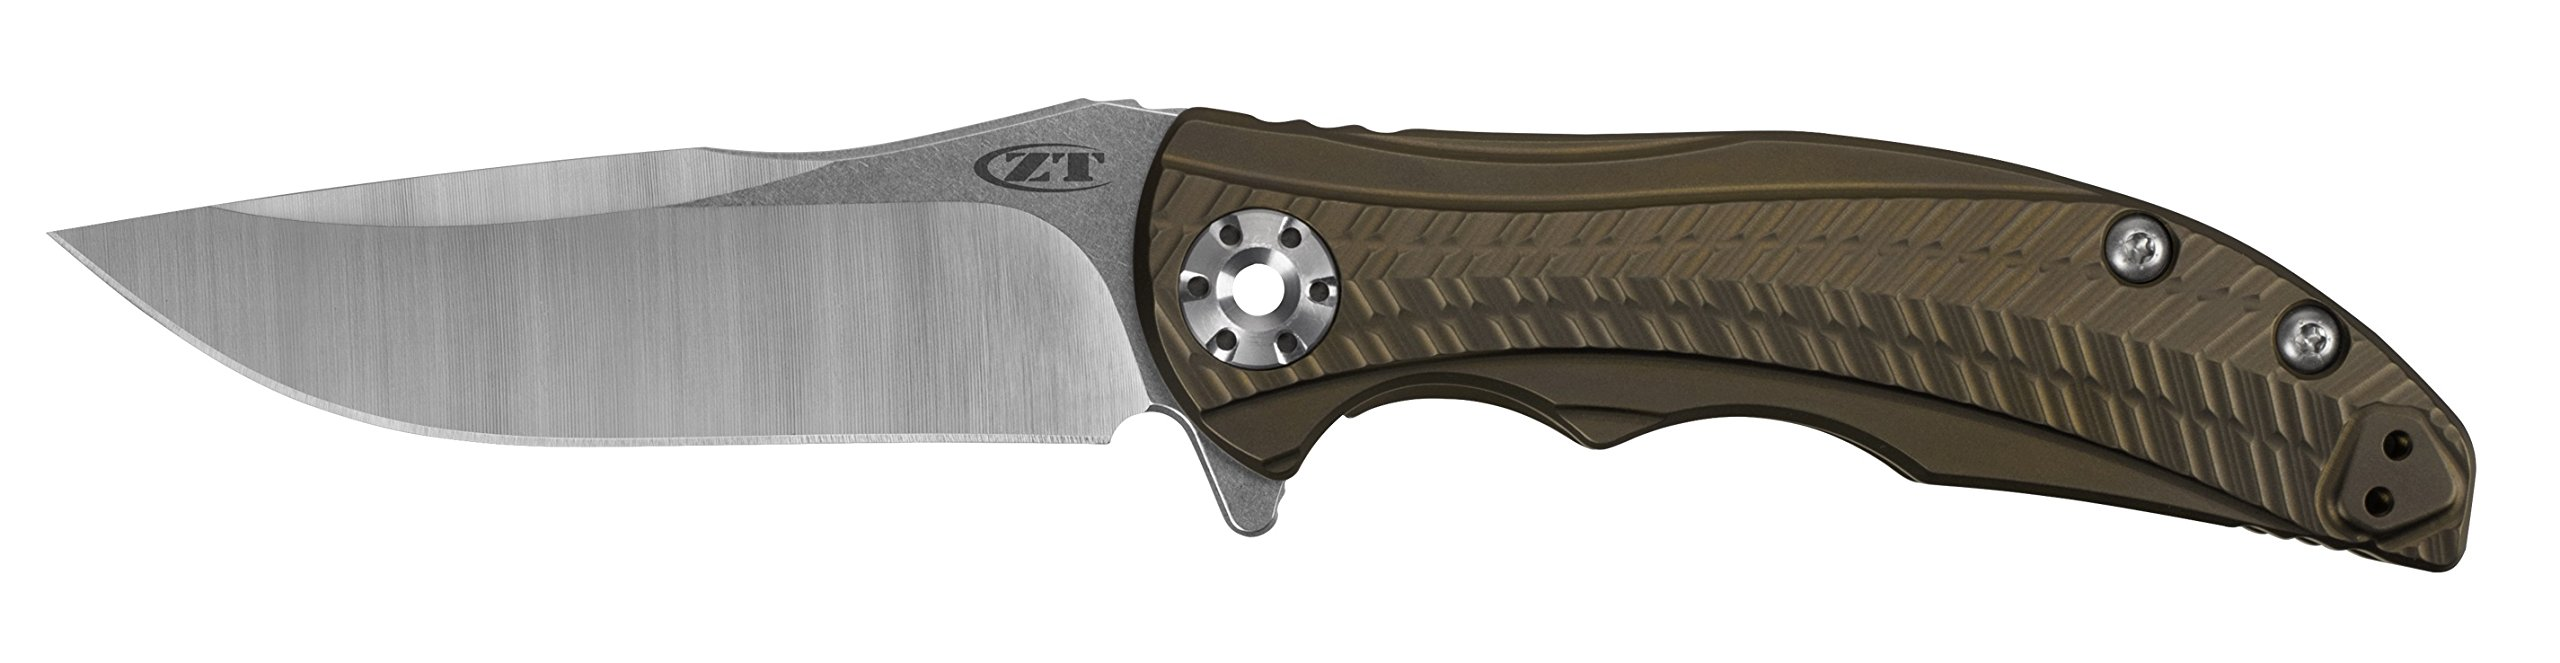 Zero Tolerance Rj Martin Kvt Pocketknives